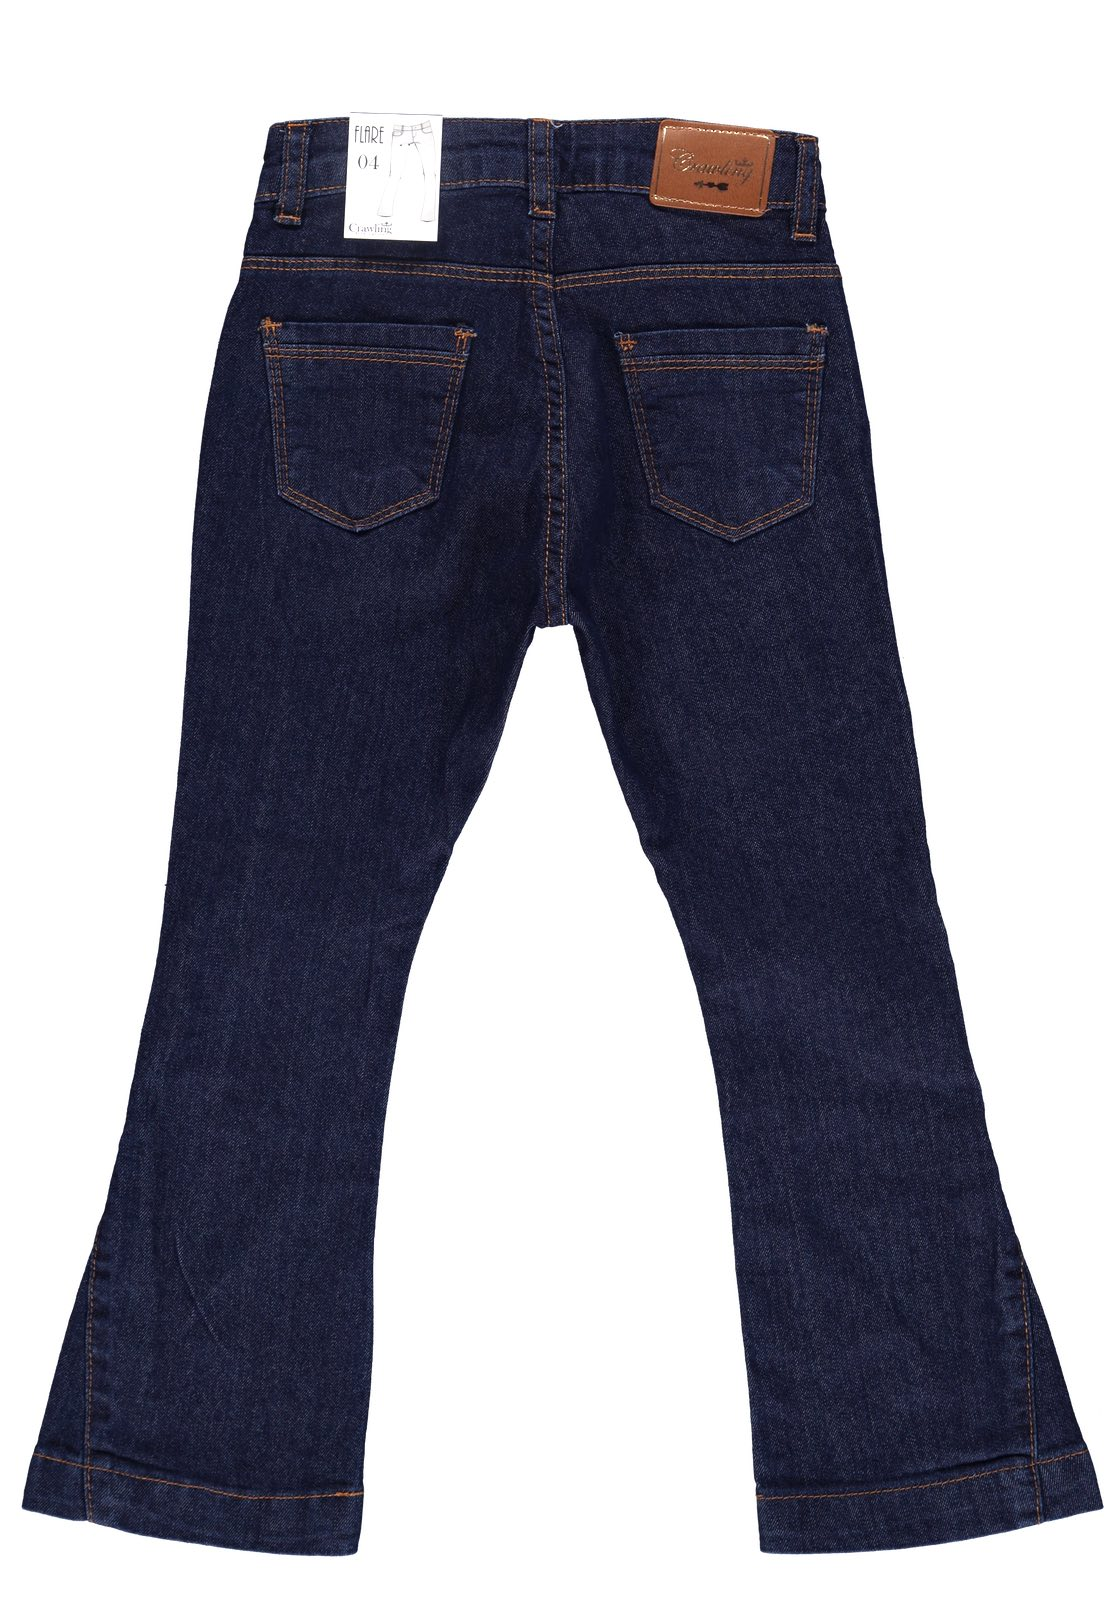 Calça Feminina Crawling Flare Jeans